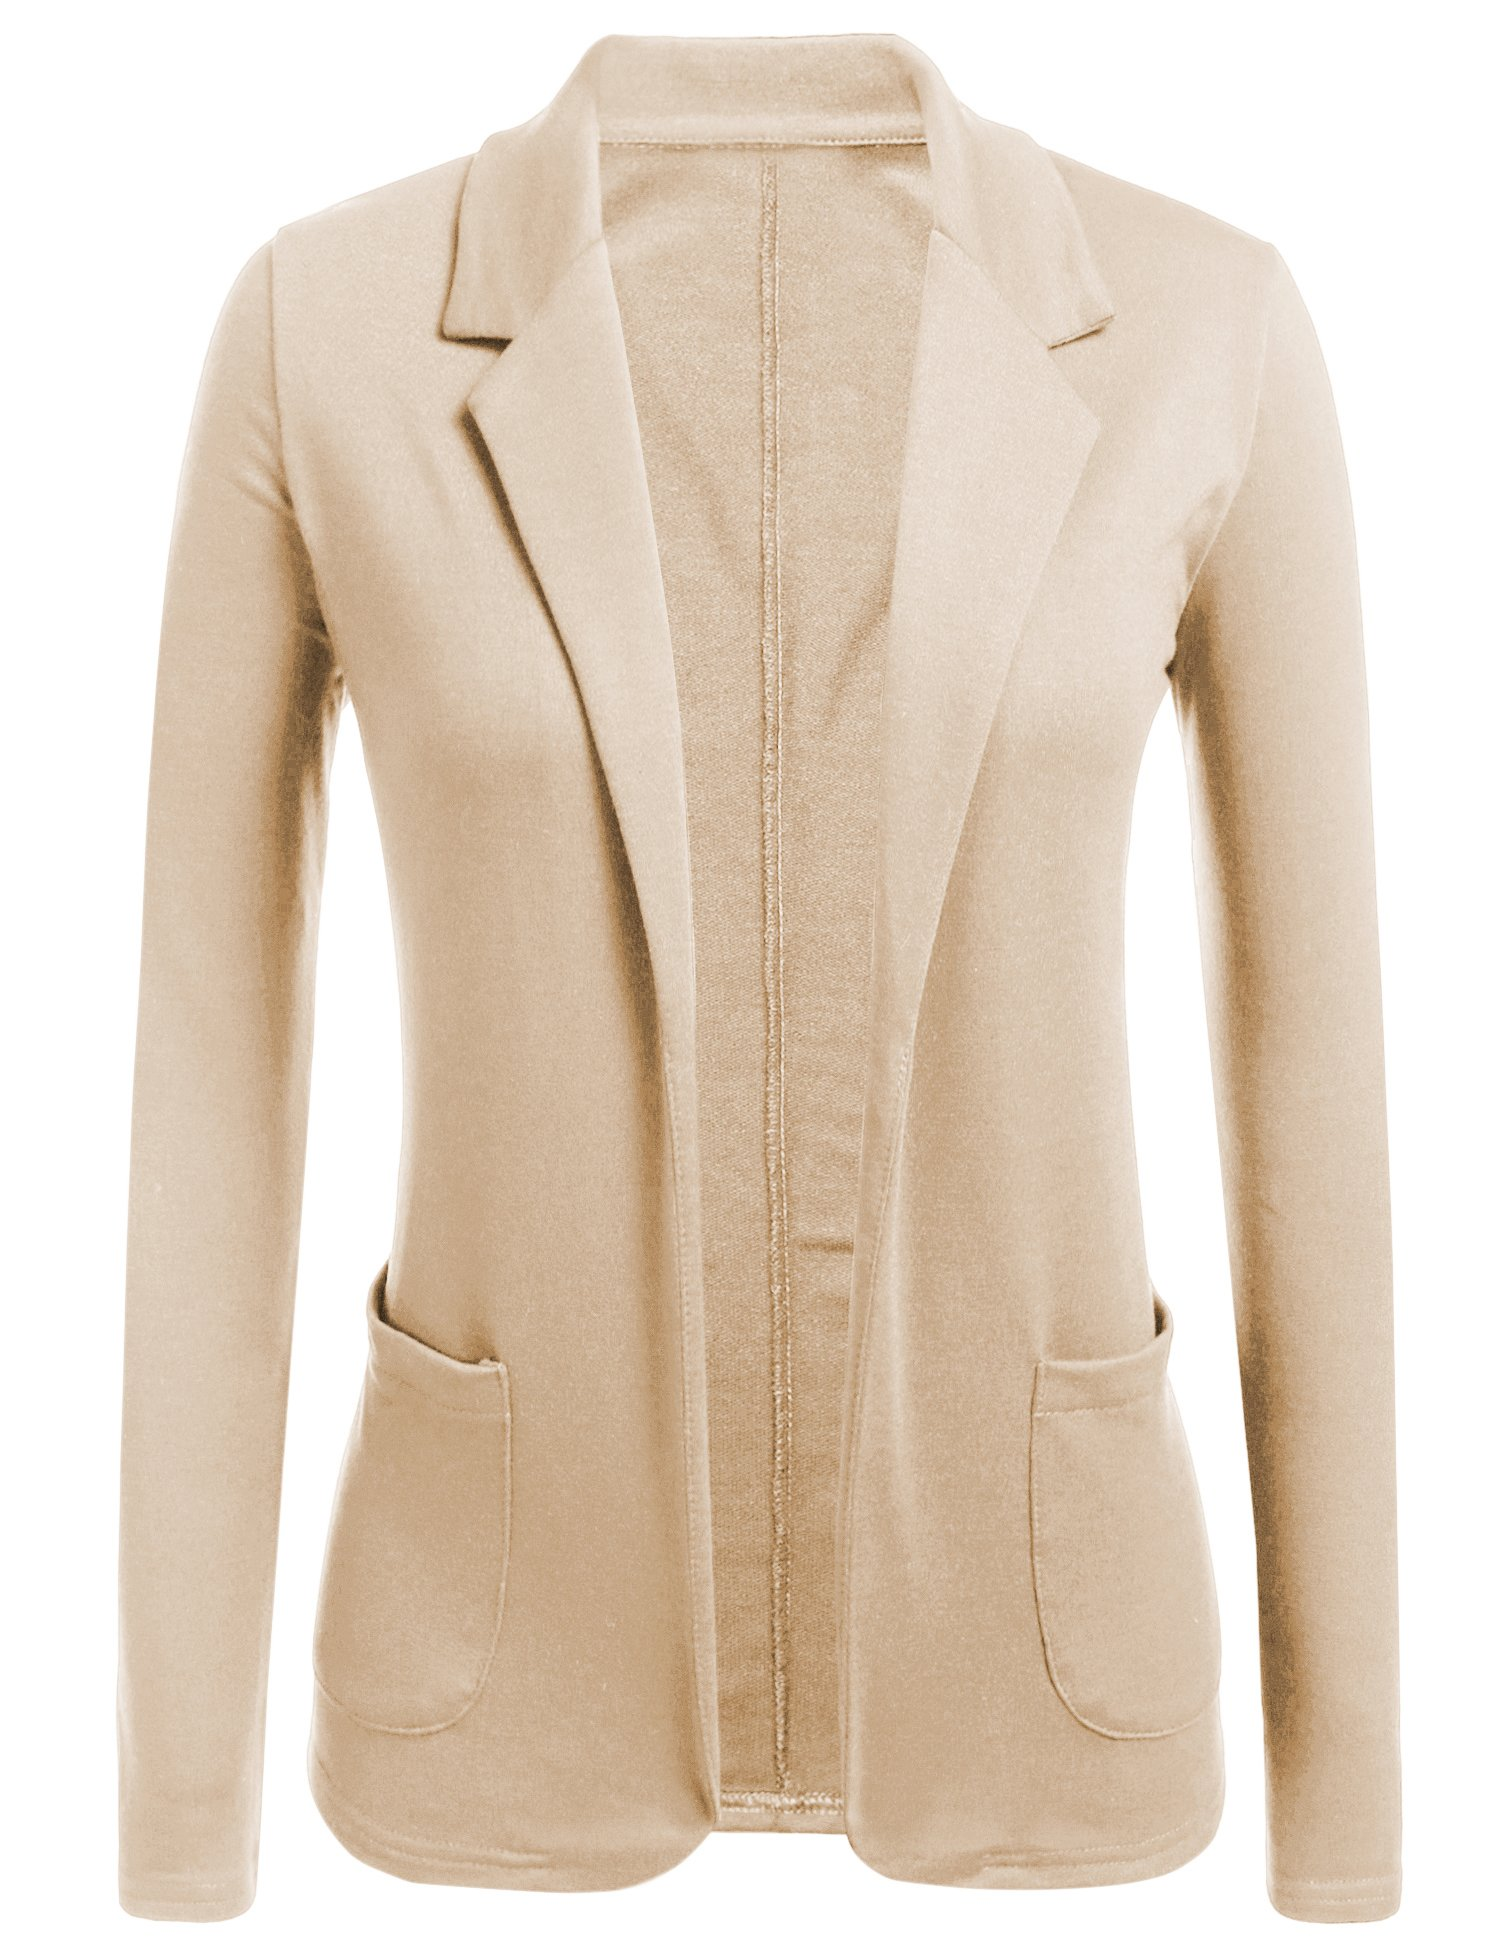 Concep Womens Open Front Blazer Long Sleeve Slim Fit Work Office Cardigan Jacket (Khika, M)